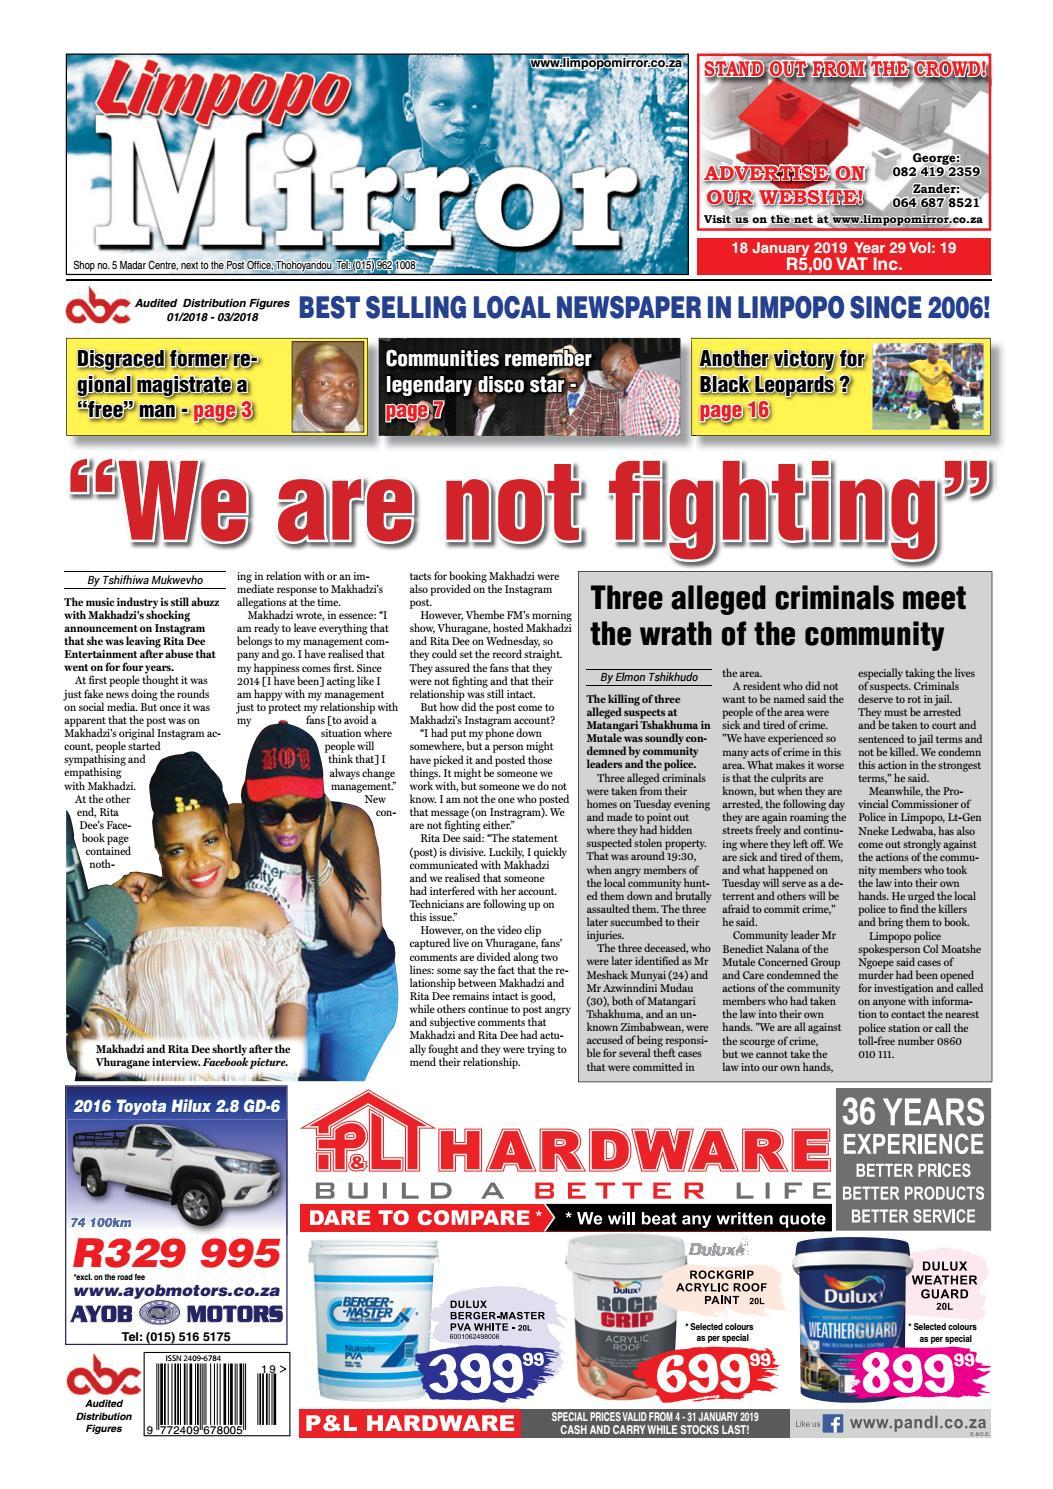 Limpopo Mirror 18 January 2019 by Zoutnet - issuu